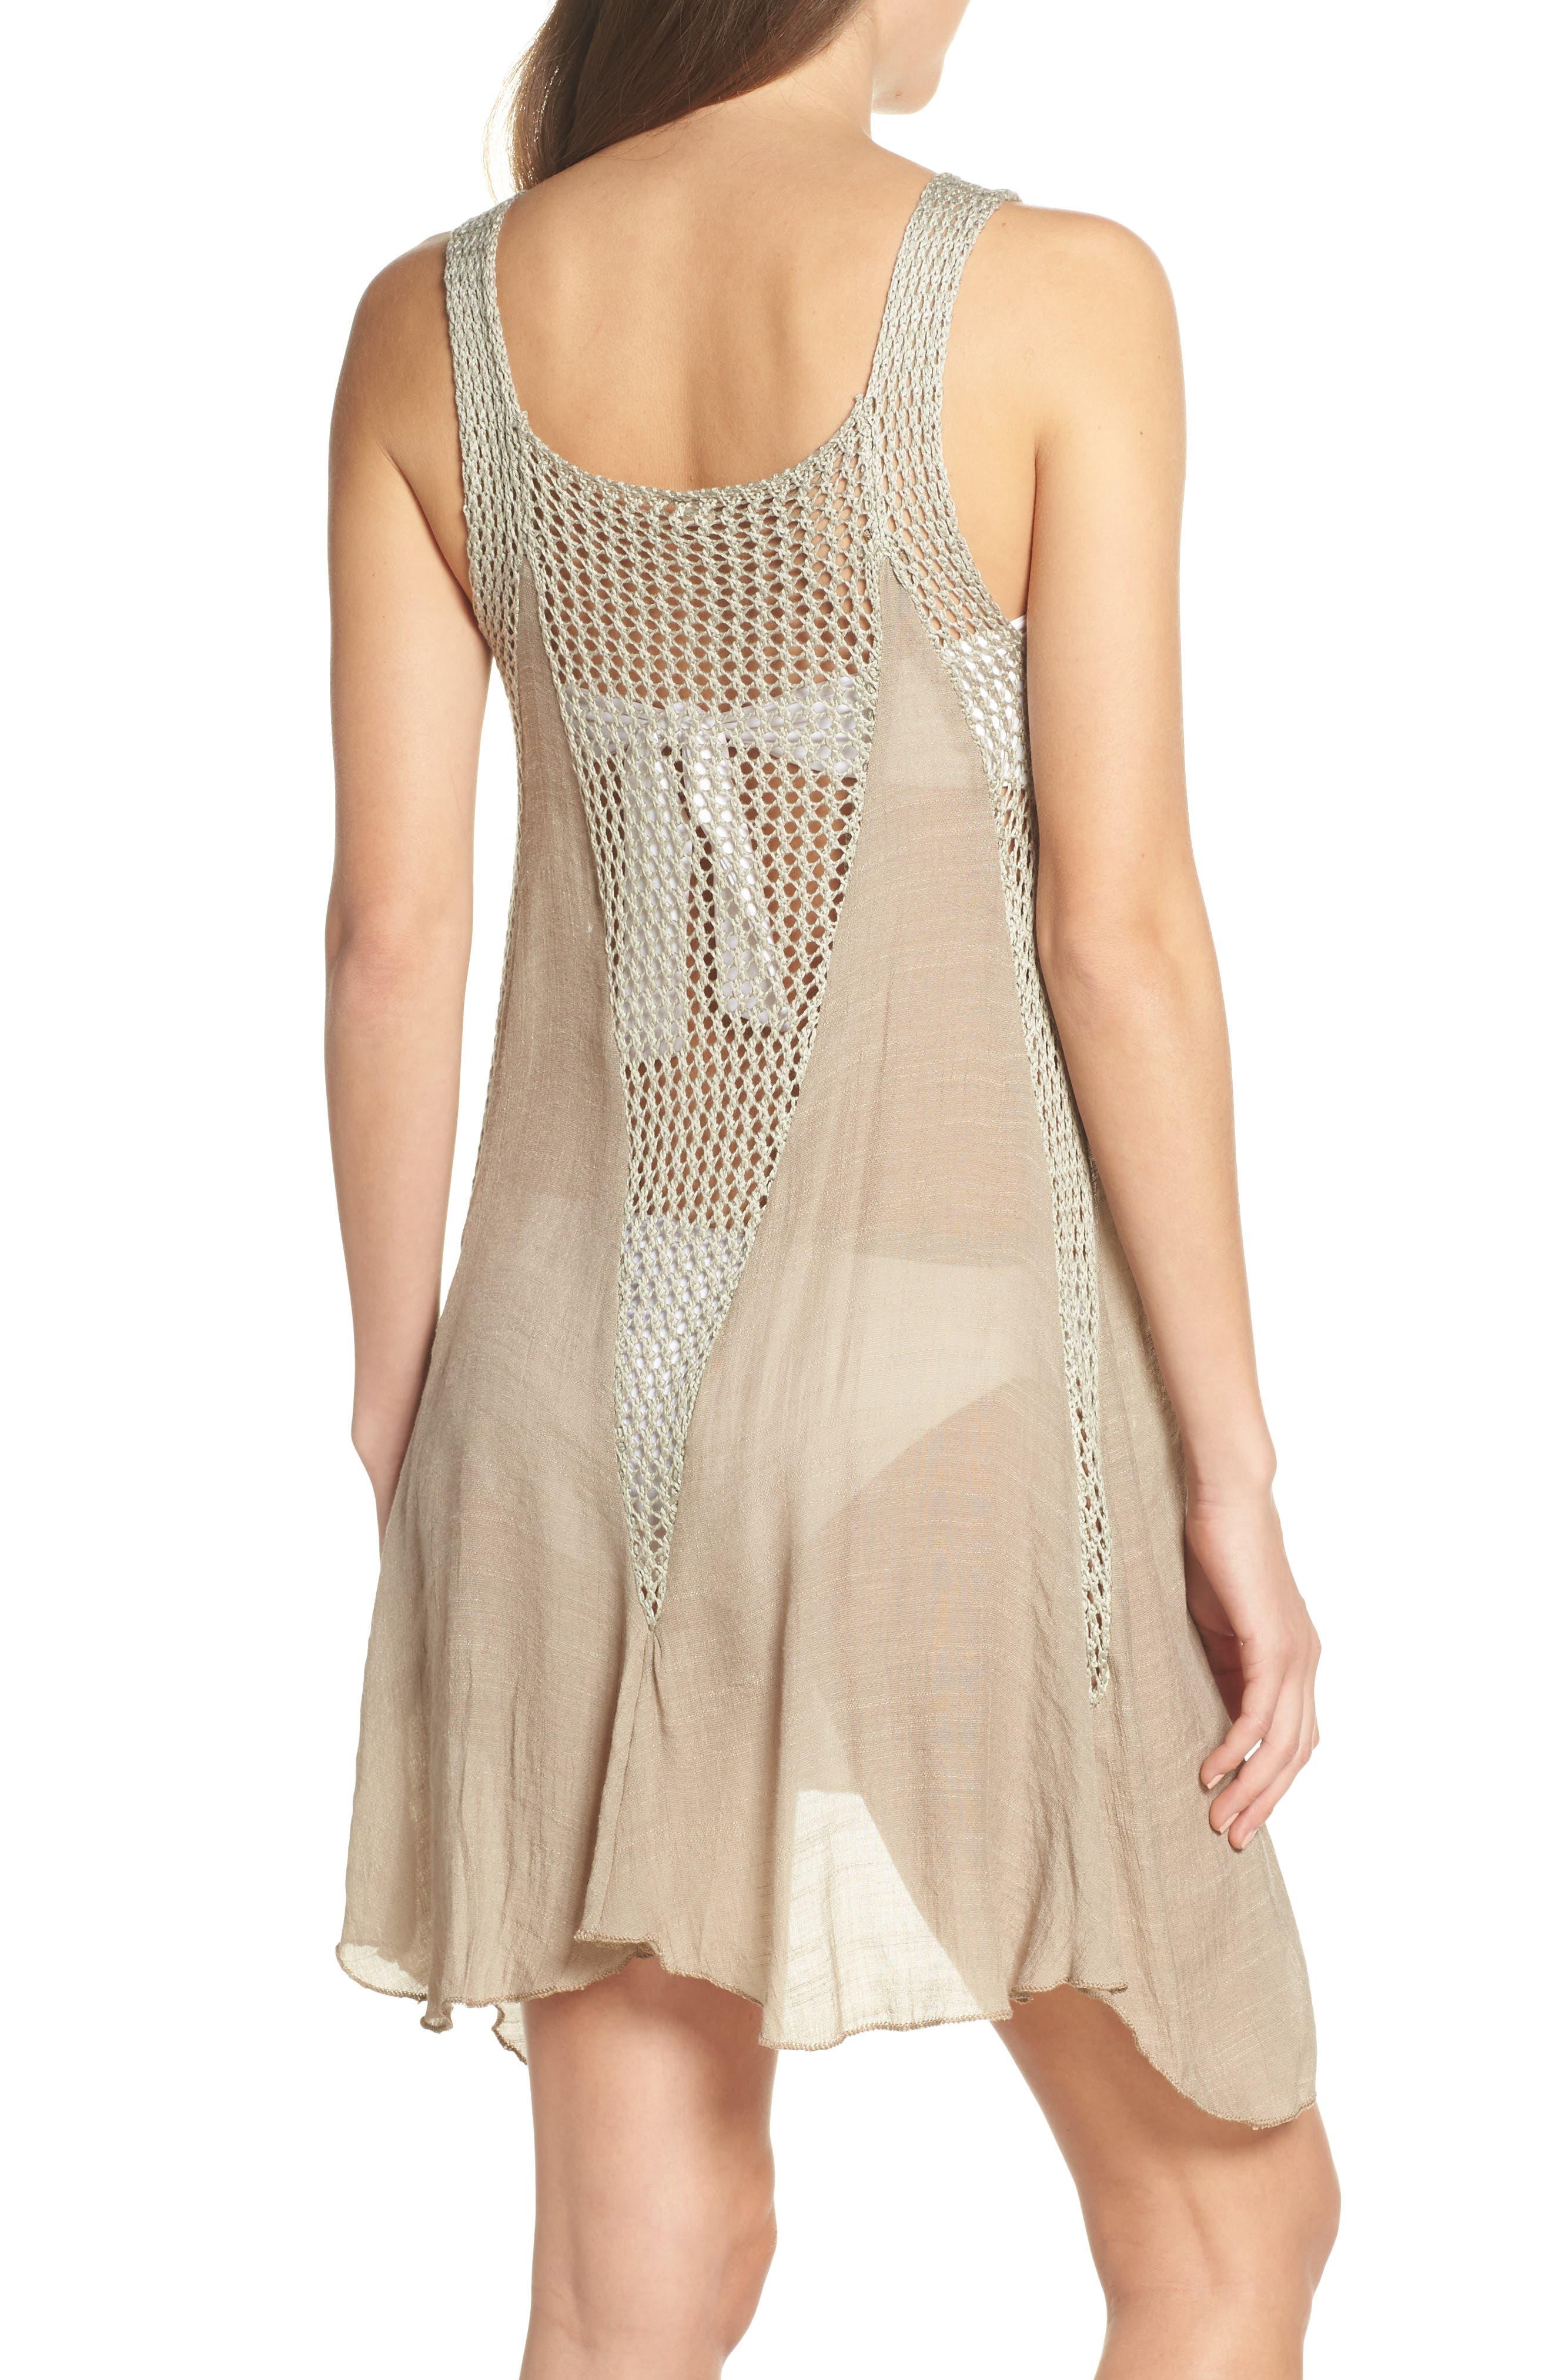 ELAN, Crochet Inset Cover-Up Dress, Alternate thumbnail 2, color, SAGE